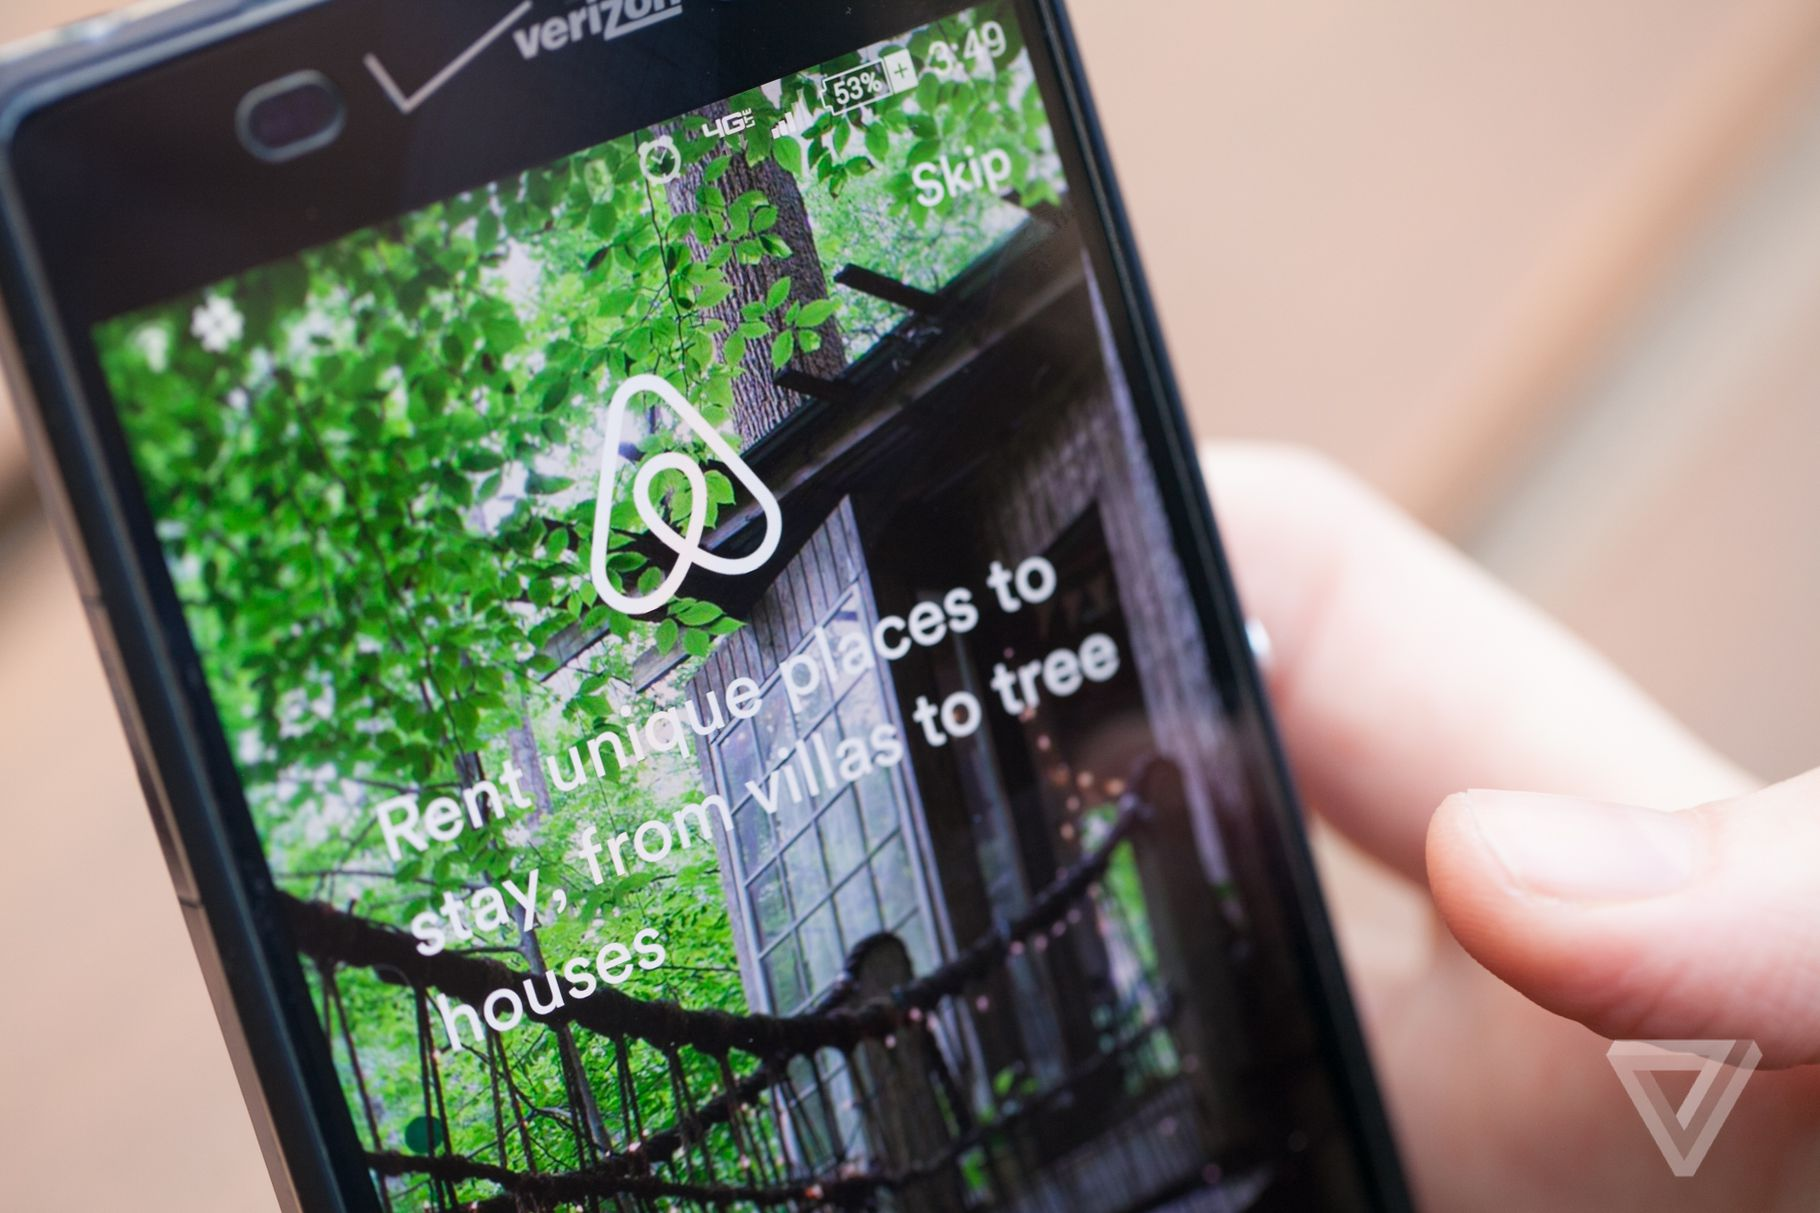 https://www.dotmug.net/wp-content/uploads/2018/05/airbnb-travel-stories1.jpg